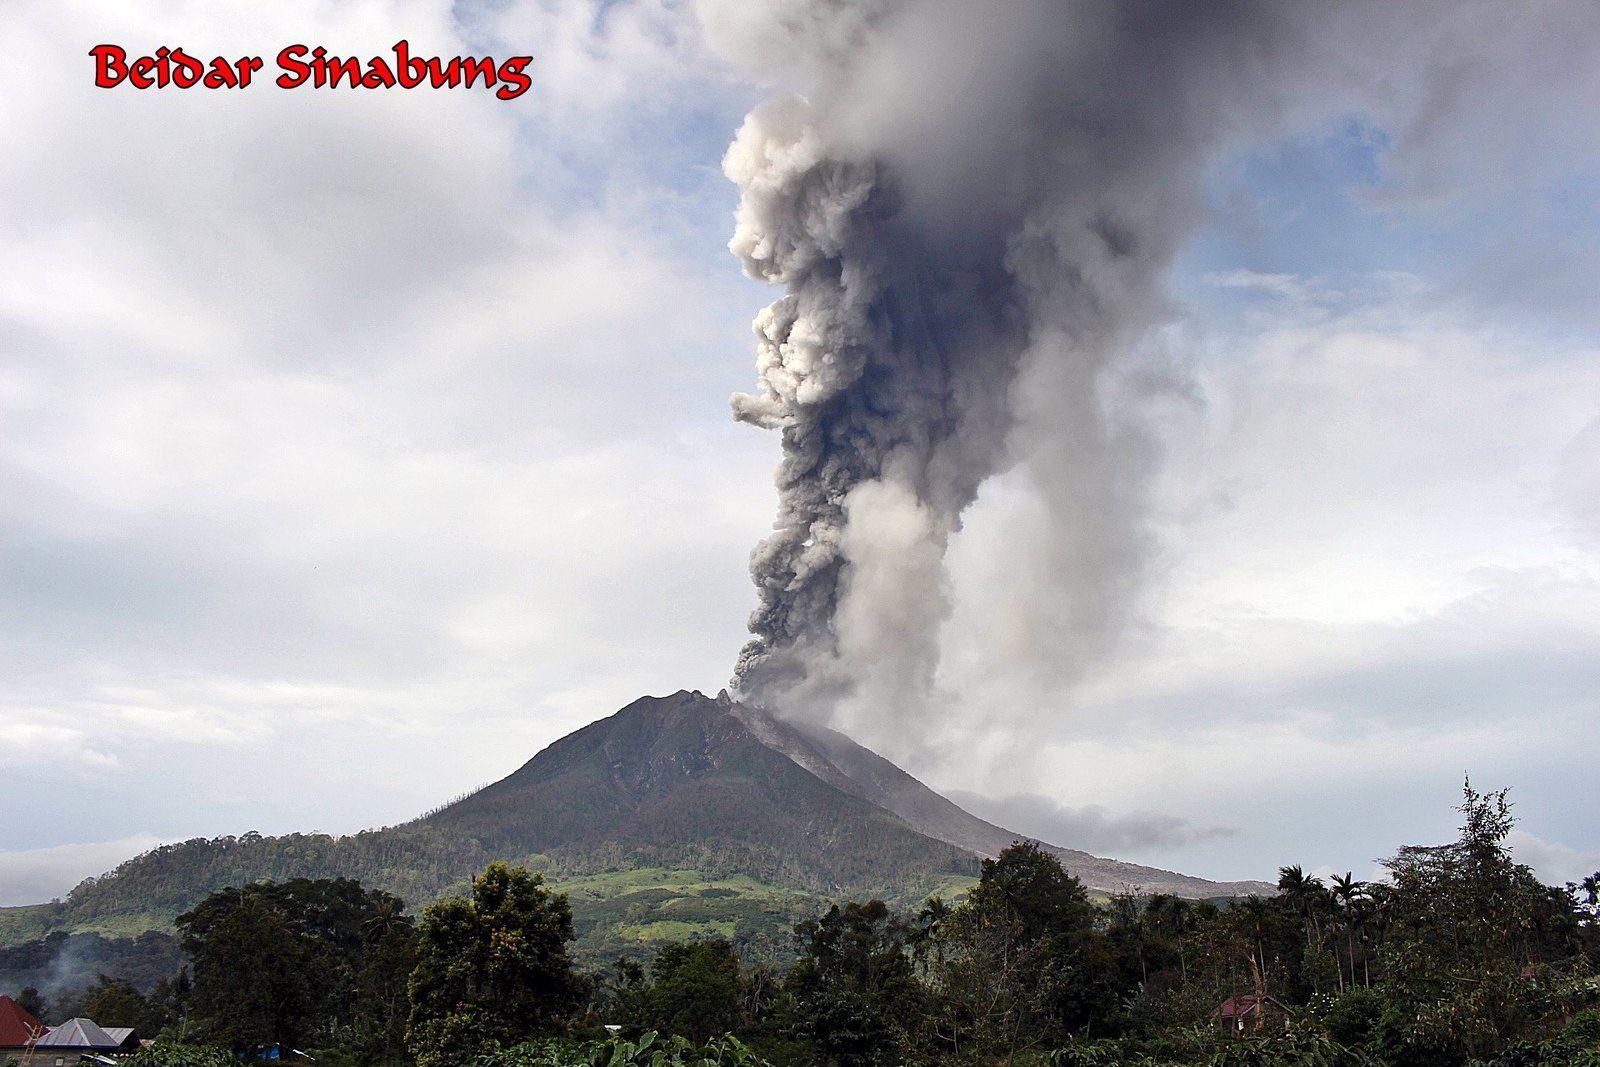 Sinabung - panache du 08.12.2017 / 14h58 WIB - photo Firdaus Surbakti / Beidar Sinabung